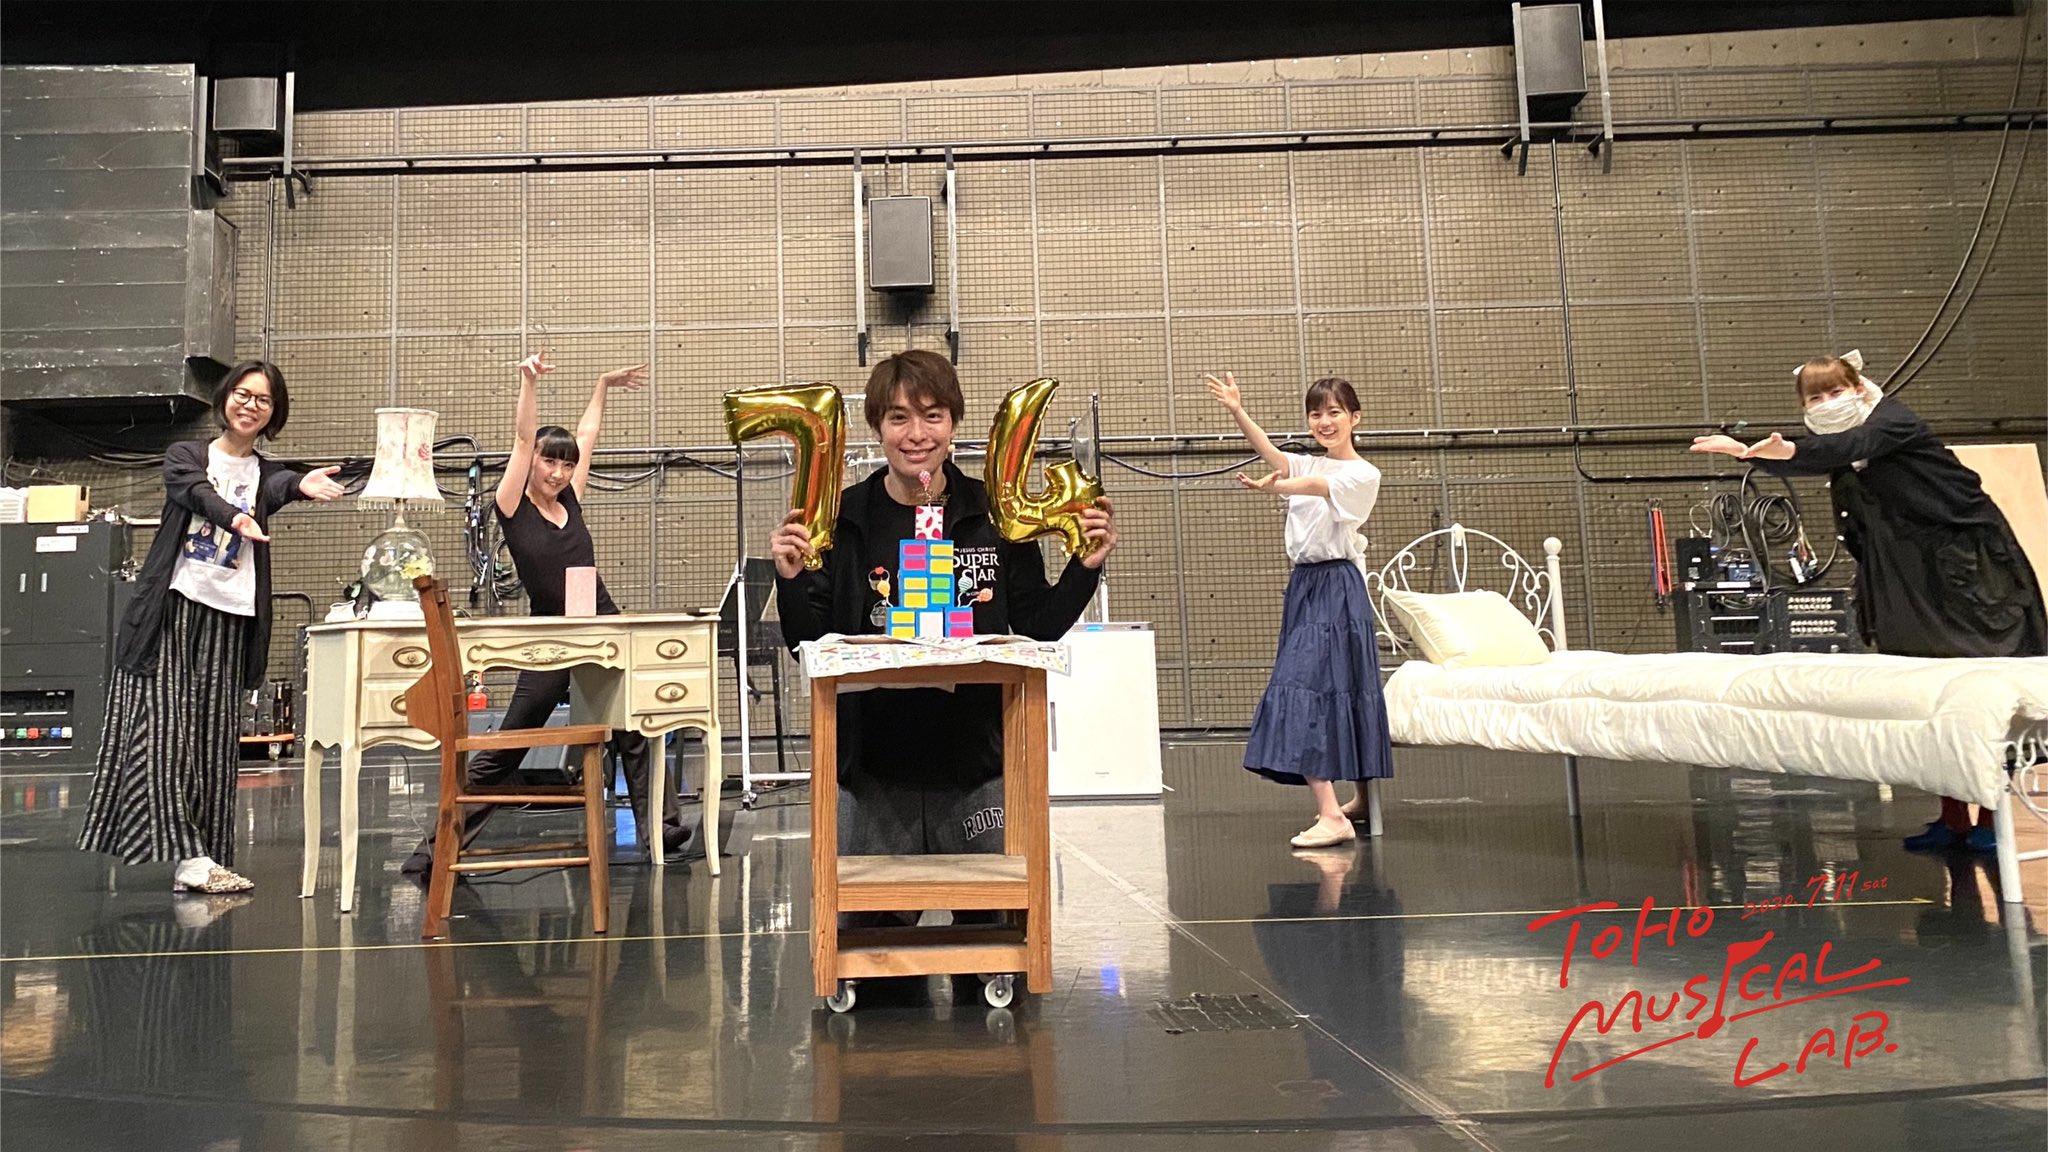 Happily Ever After 生田絵梨花が海宝直人にハッピーバースデーを歌うお誕生日お祝い動画